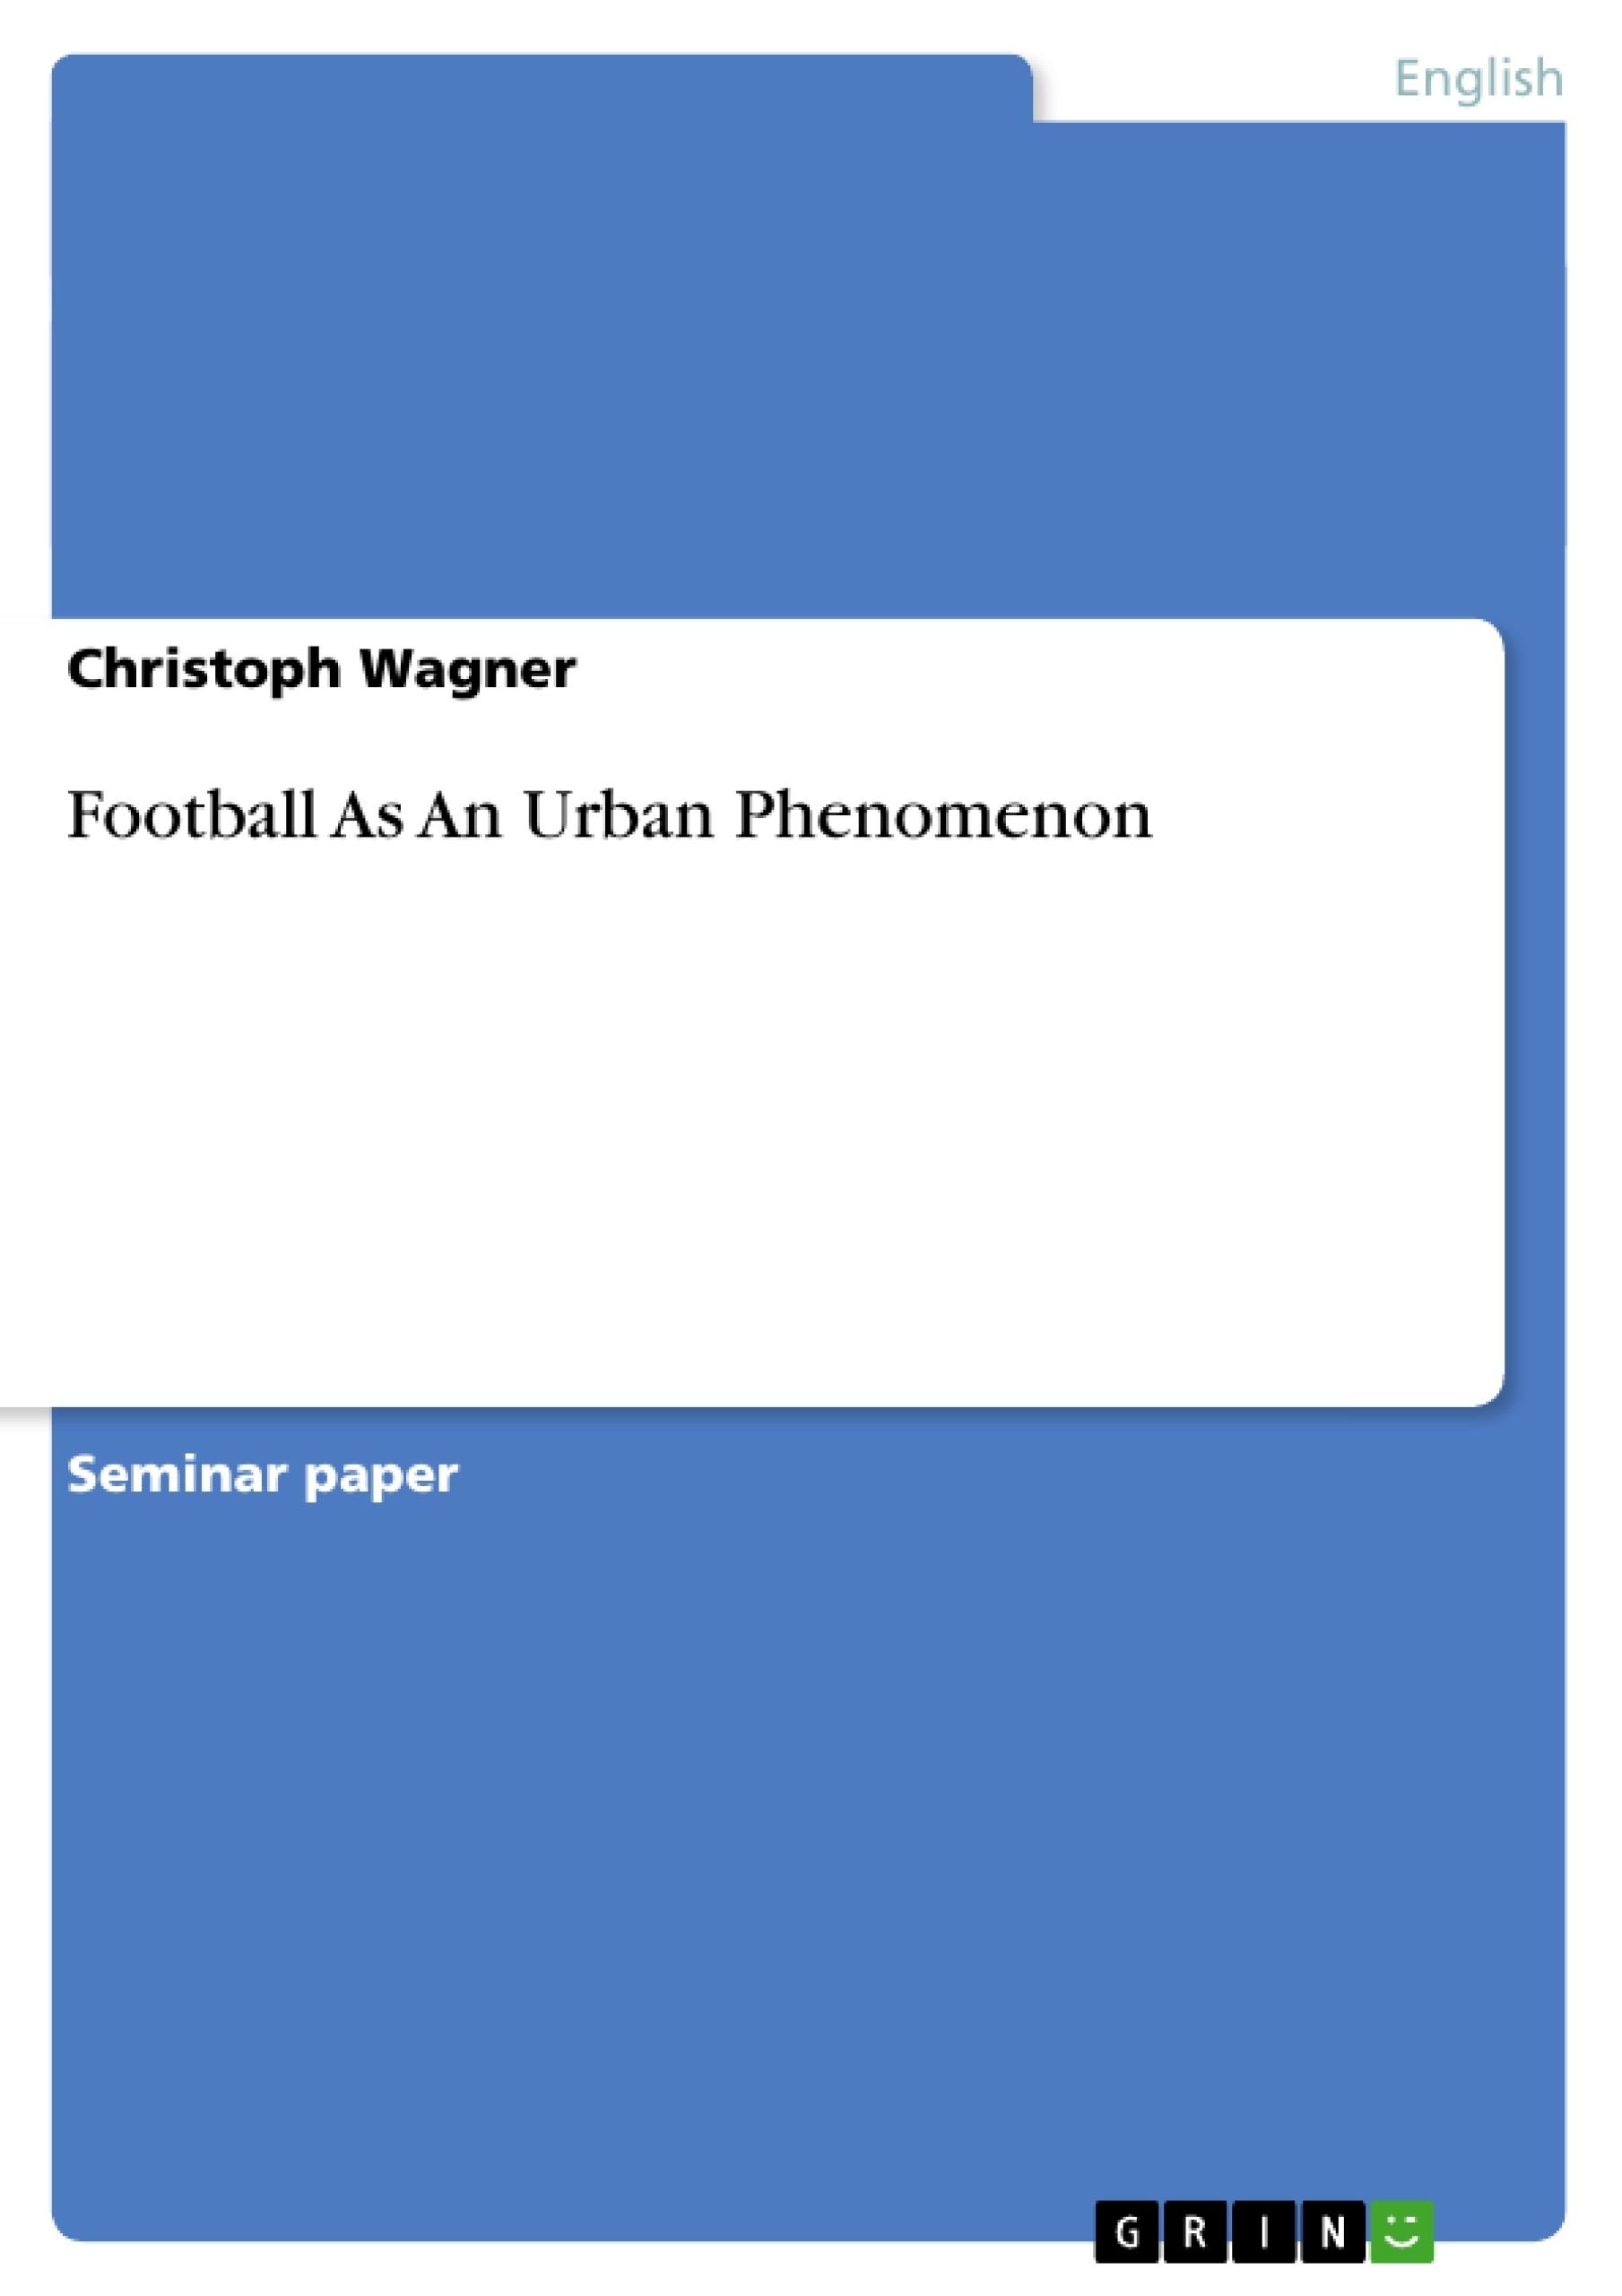 Title: Football As An Urban Phenomenon